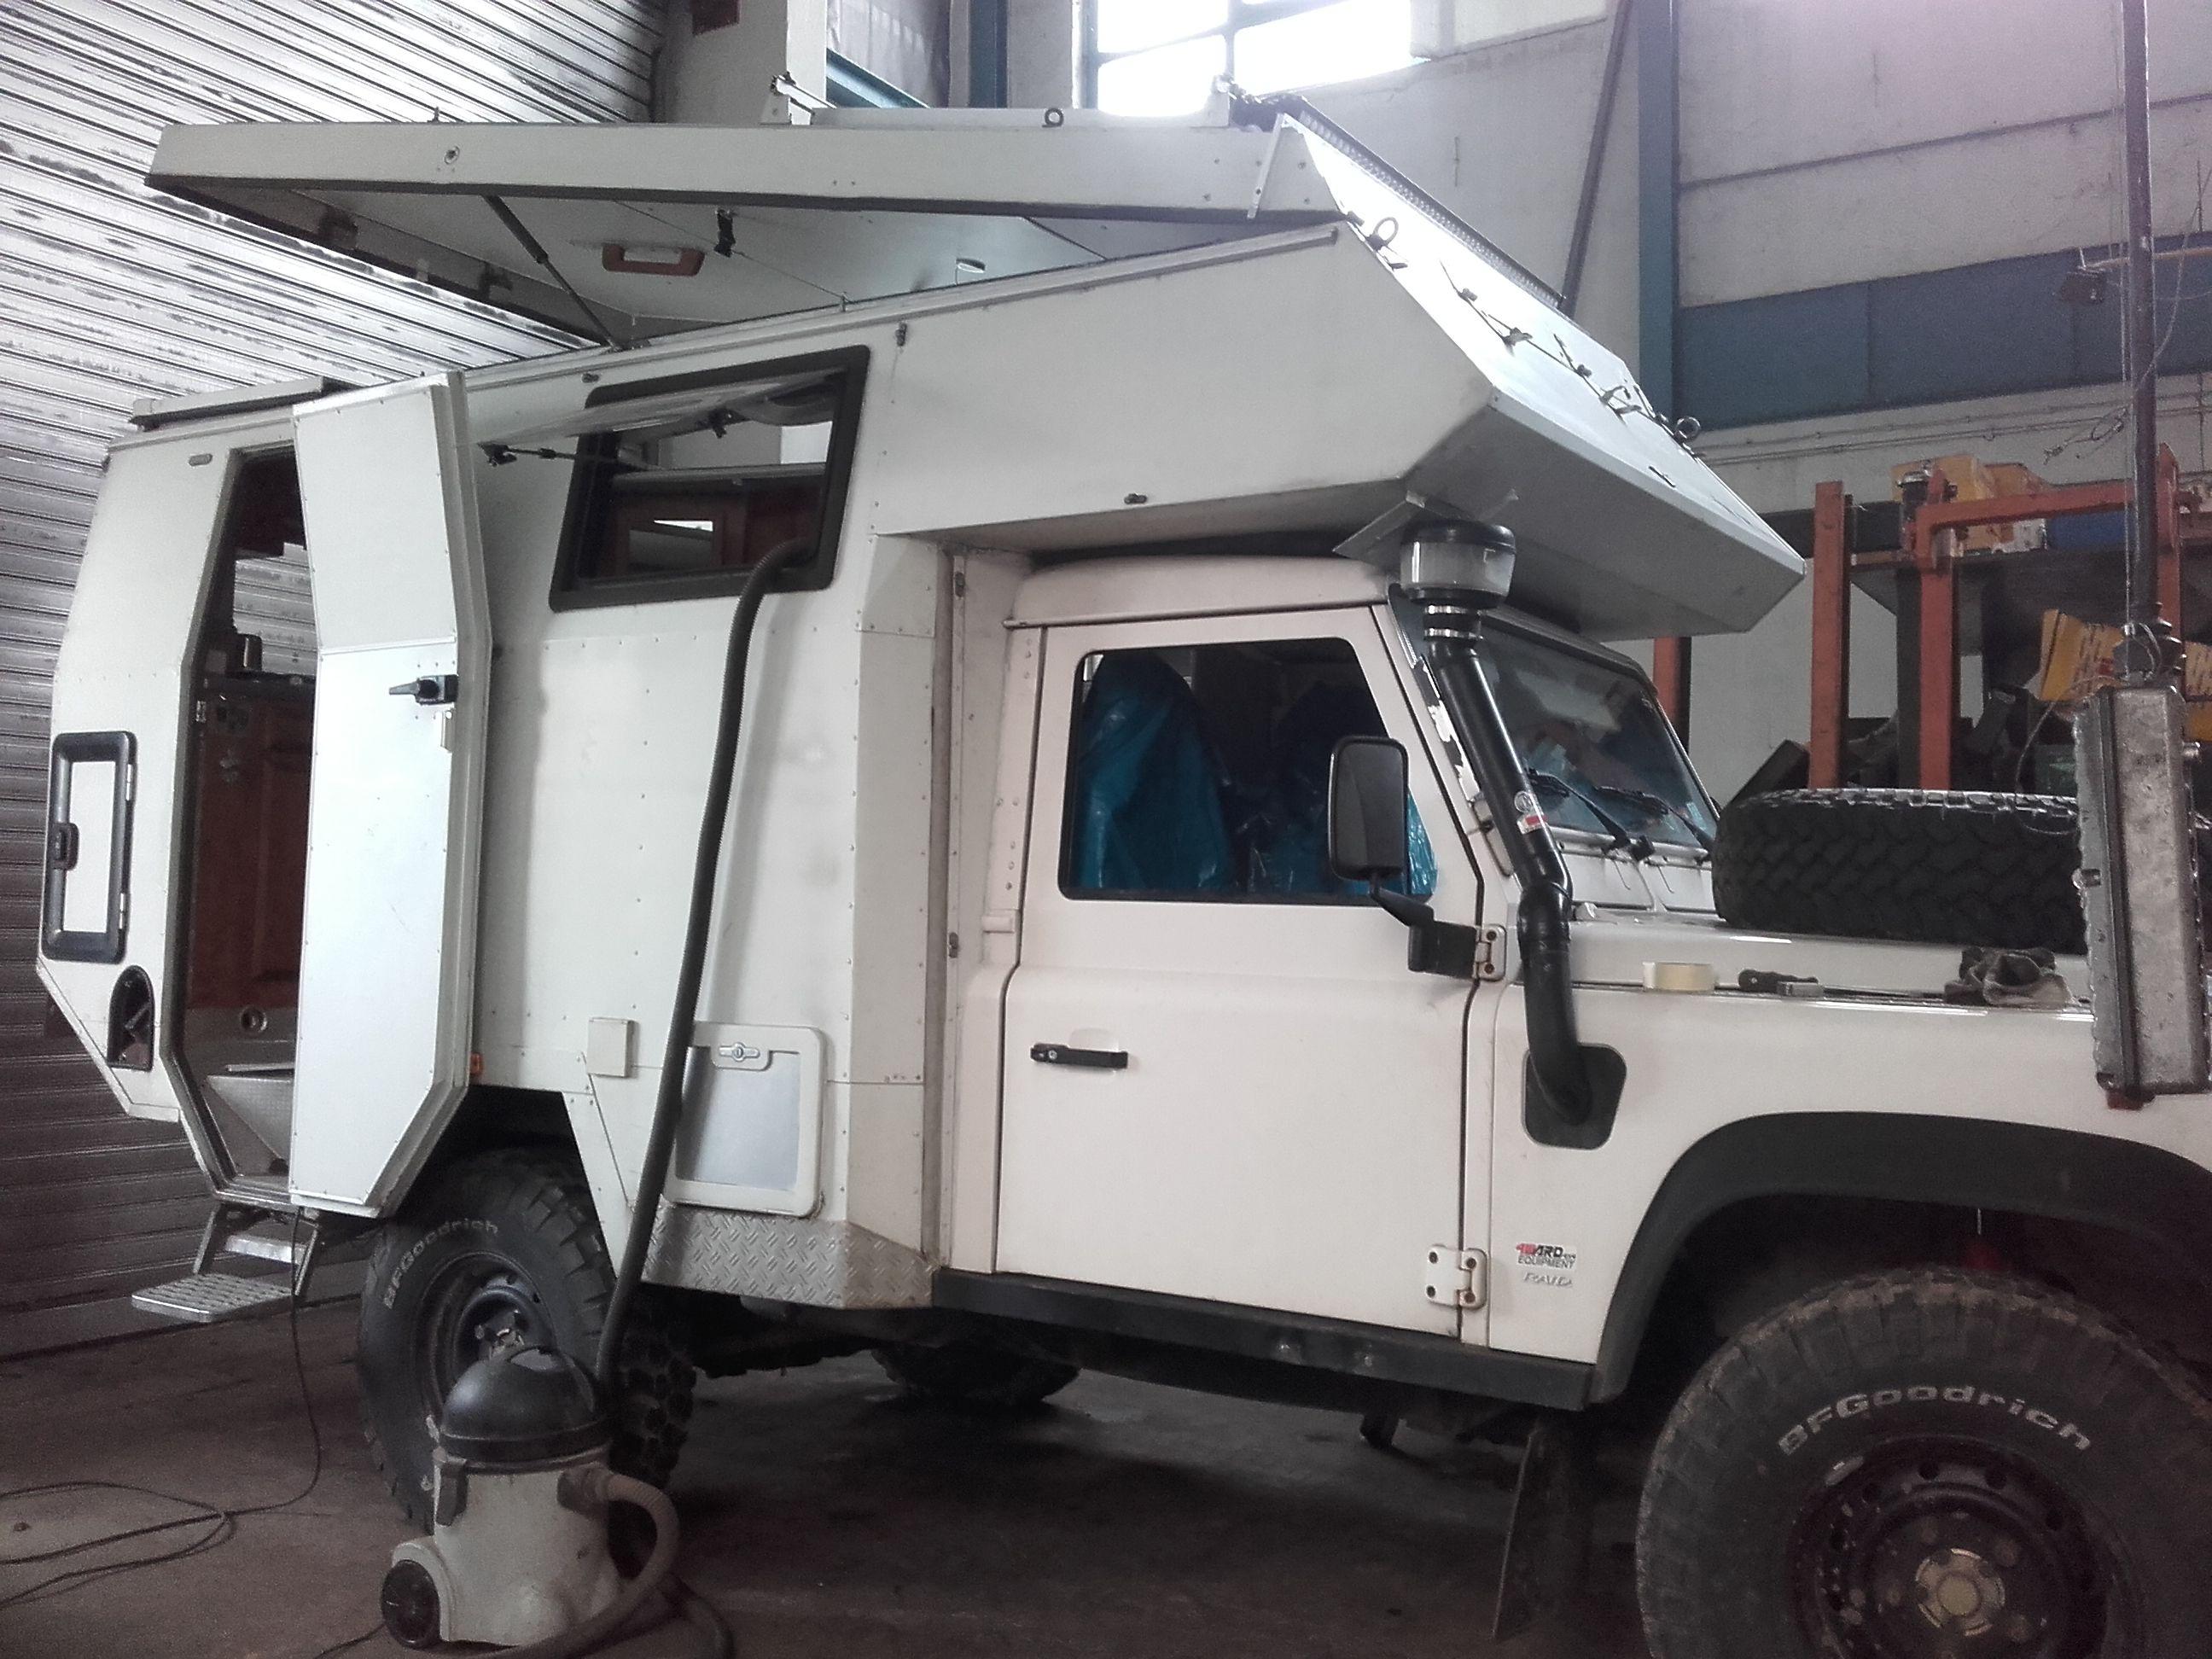 Landy Camper Basis Defender 110 Tdi Expedition And